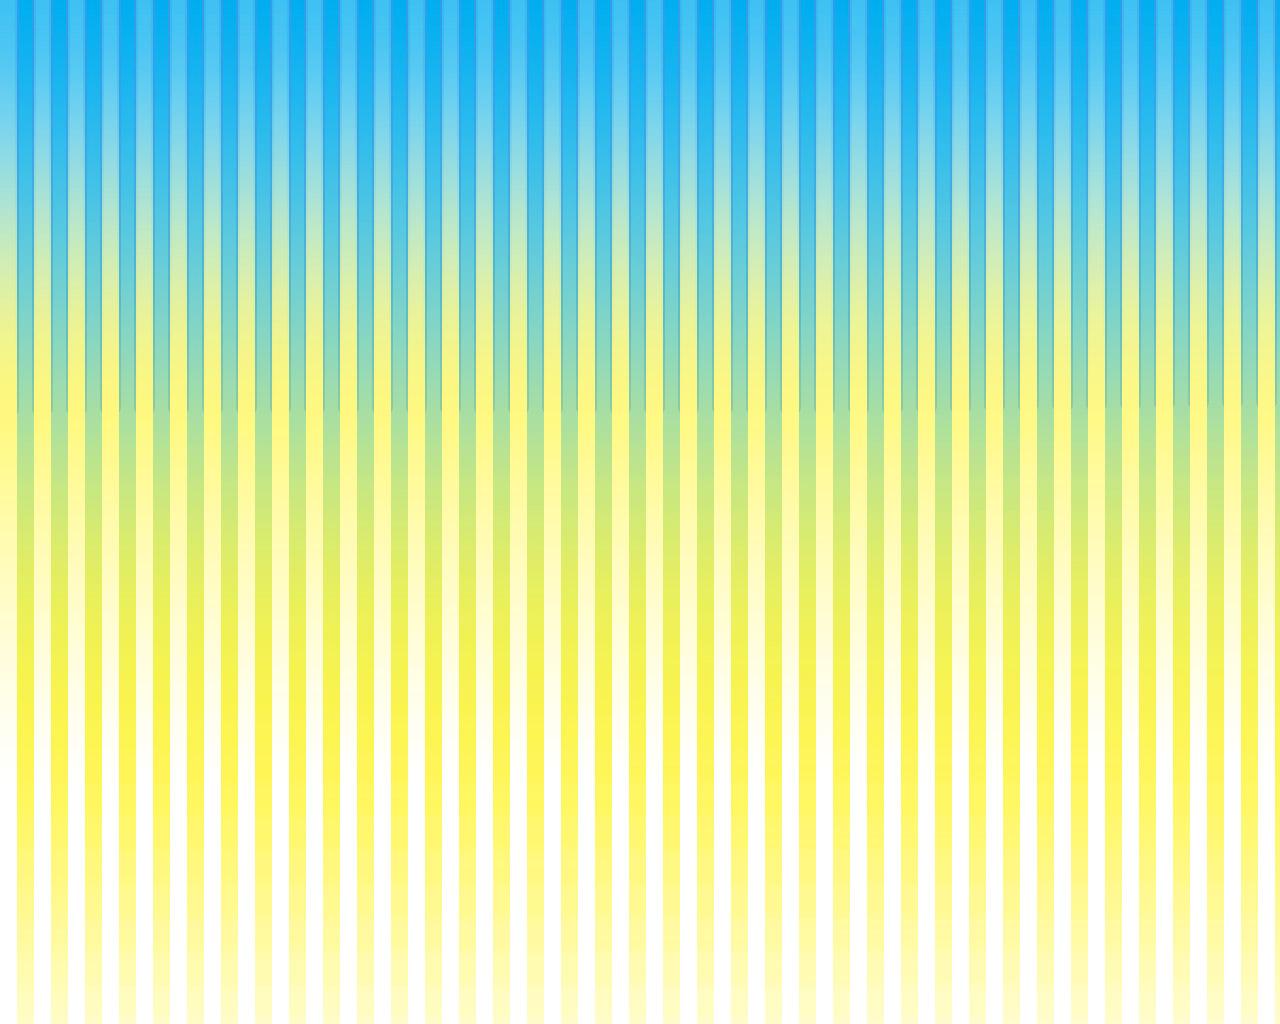 Blue Stripe Wallpaper: Light Blue And Yellow Wallpaper